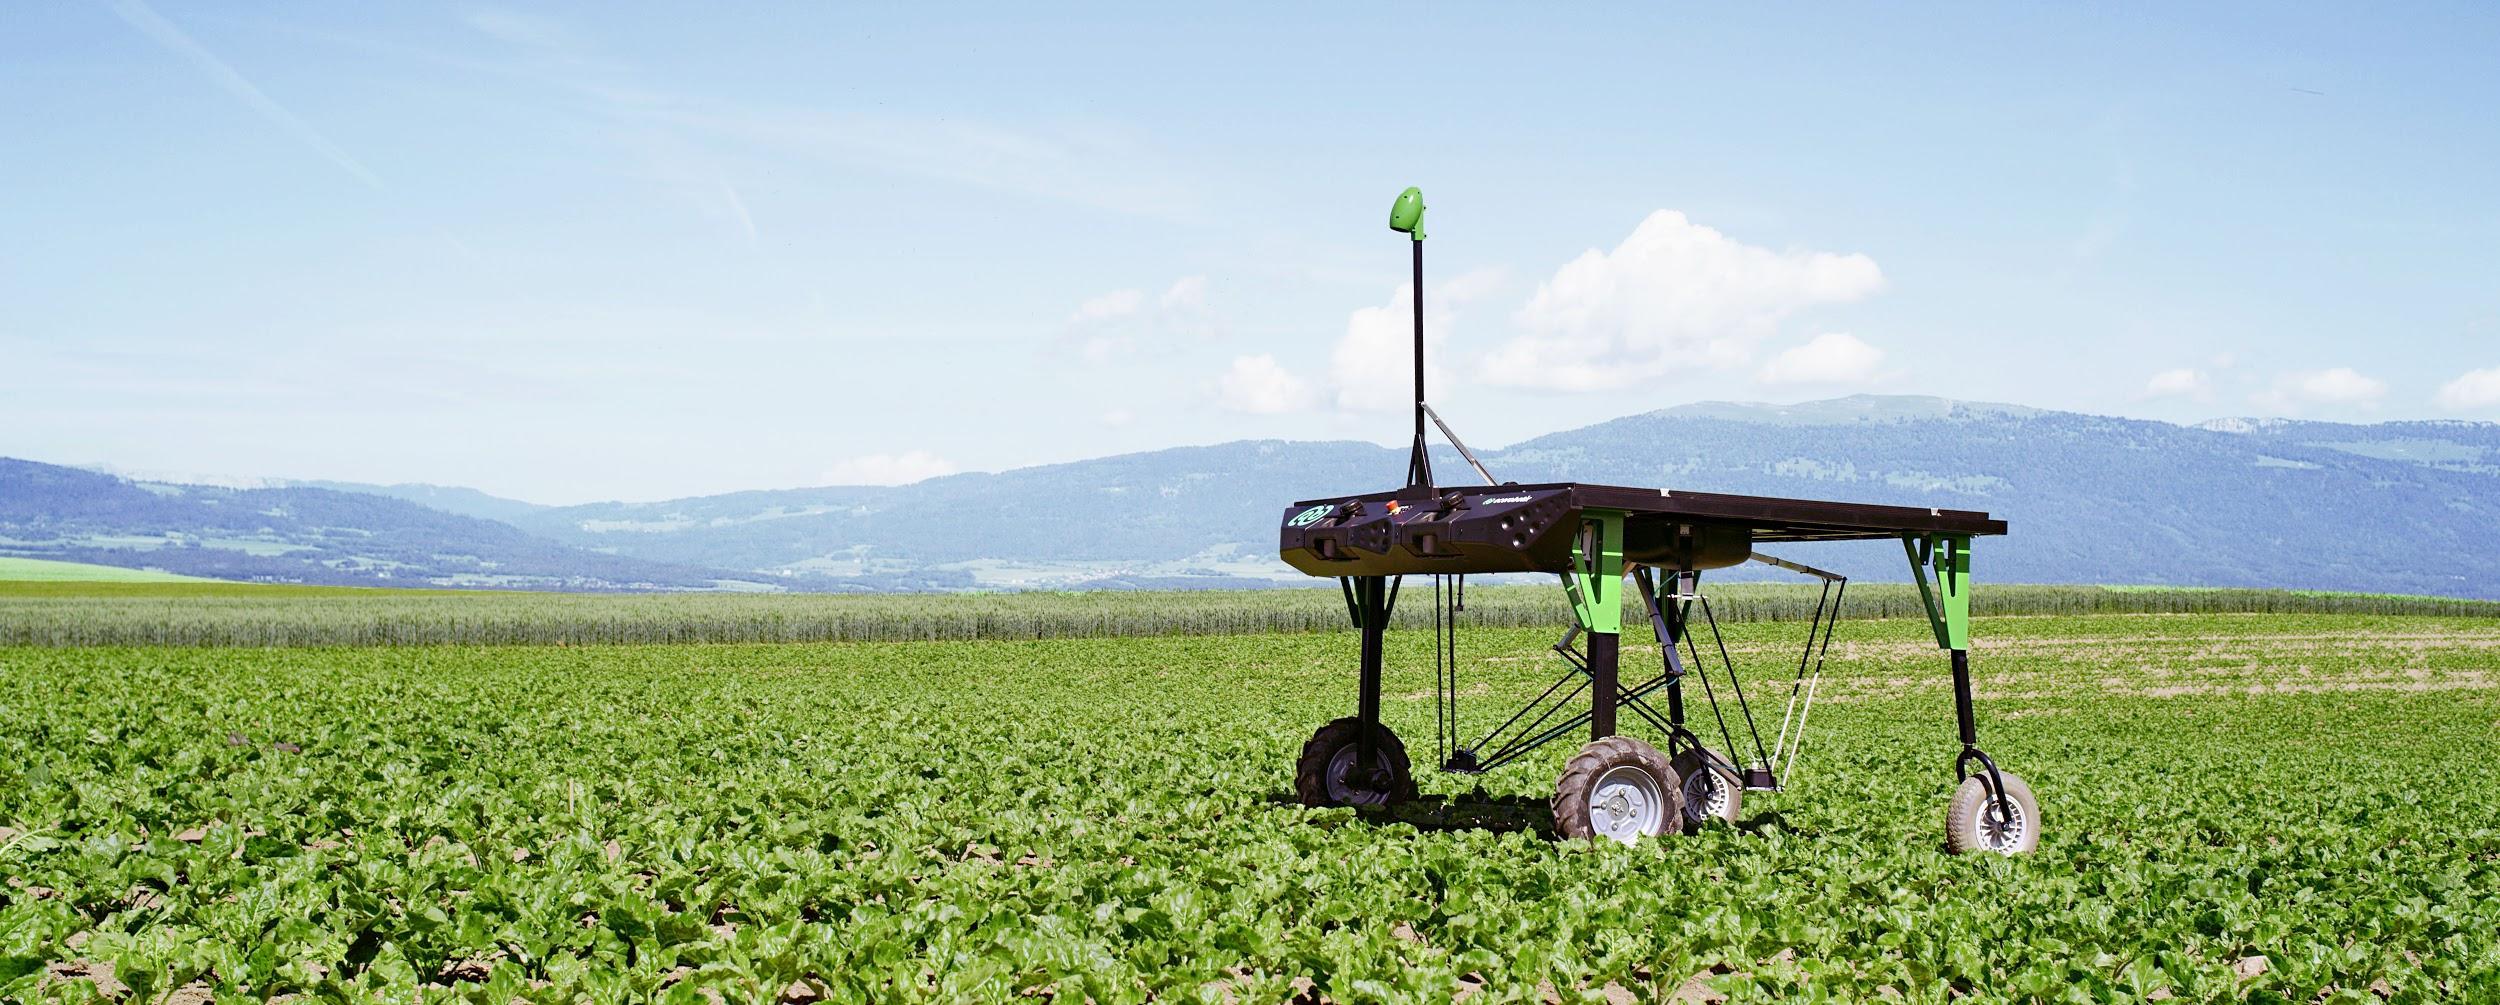 Weed control robot by Ecorobotix